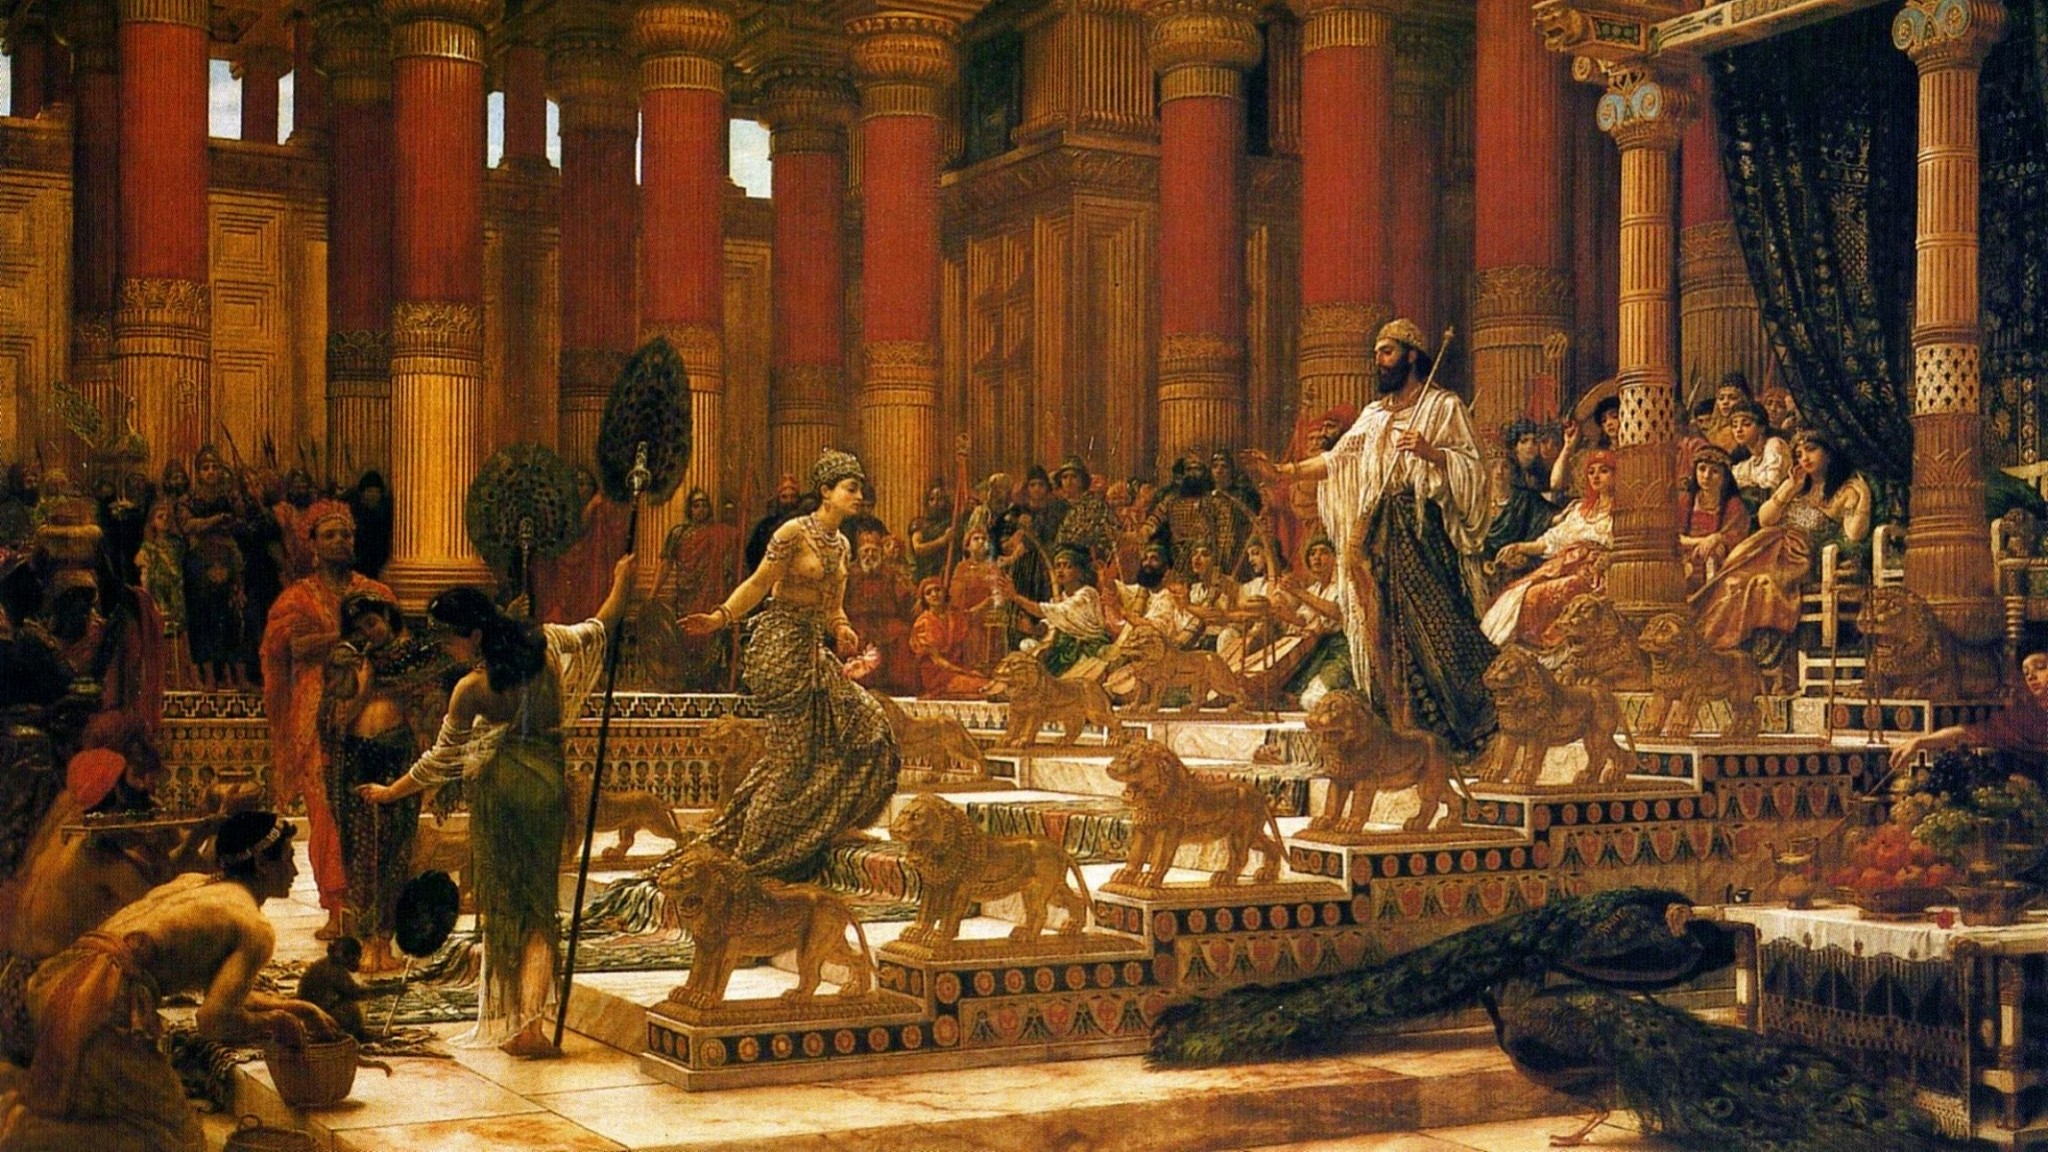 Parshat Vayakhel — James Bruce and the Ark